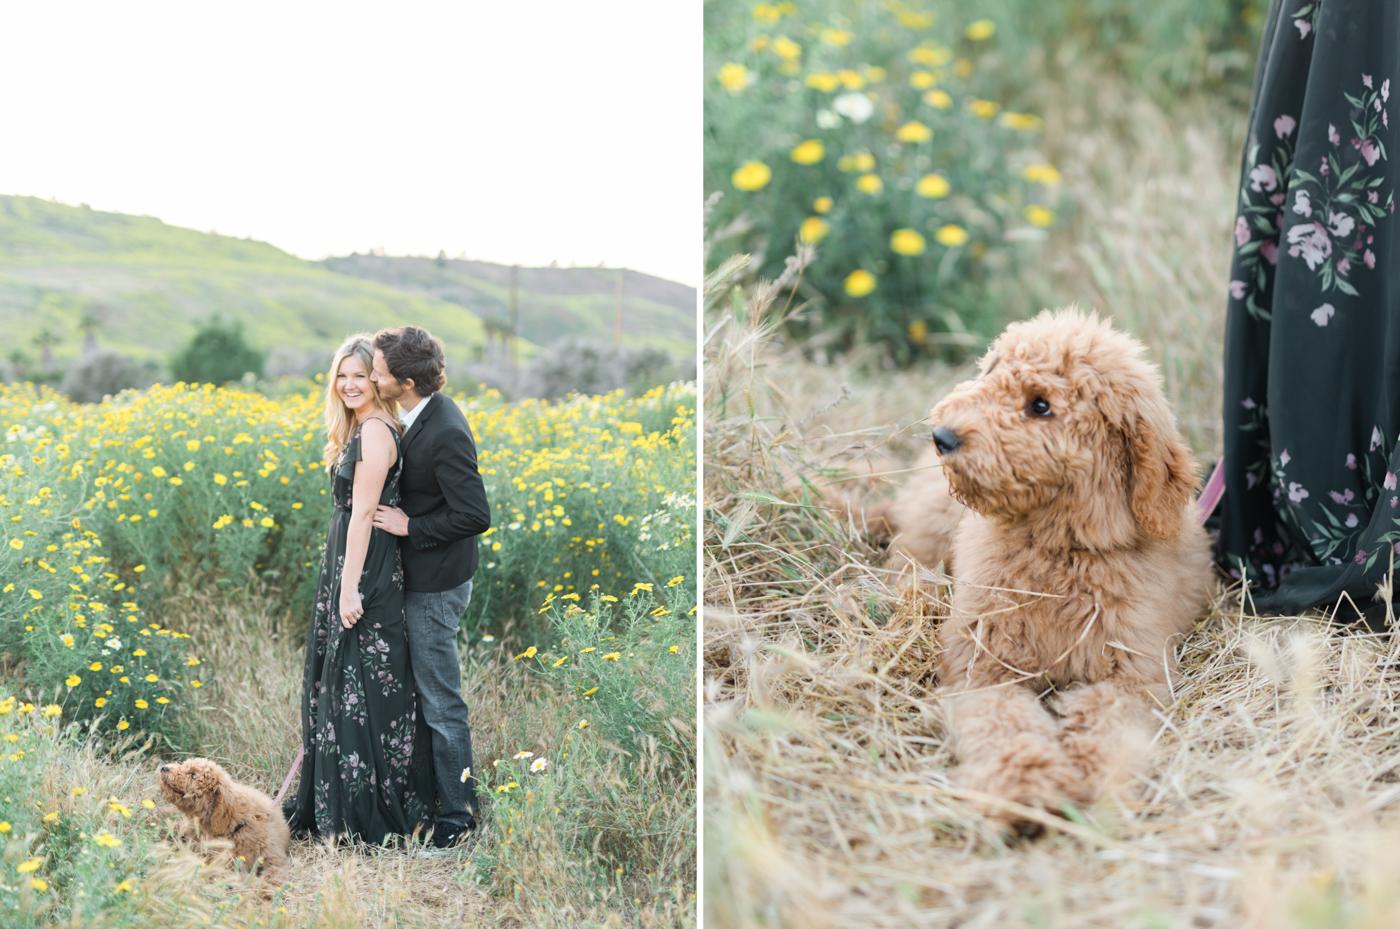 San_Juan_Capistrano_Goldendoodle_family_portrait_session_los_angeles_wedding_photographer-19.jpg